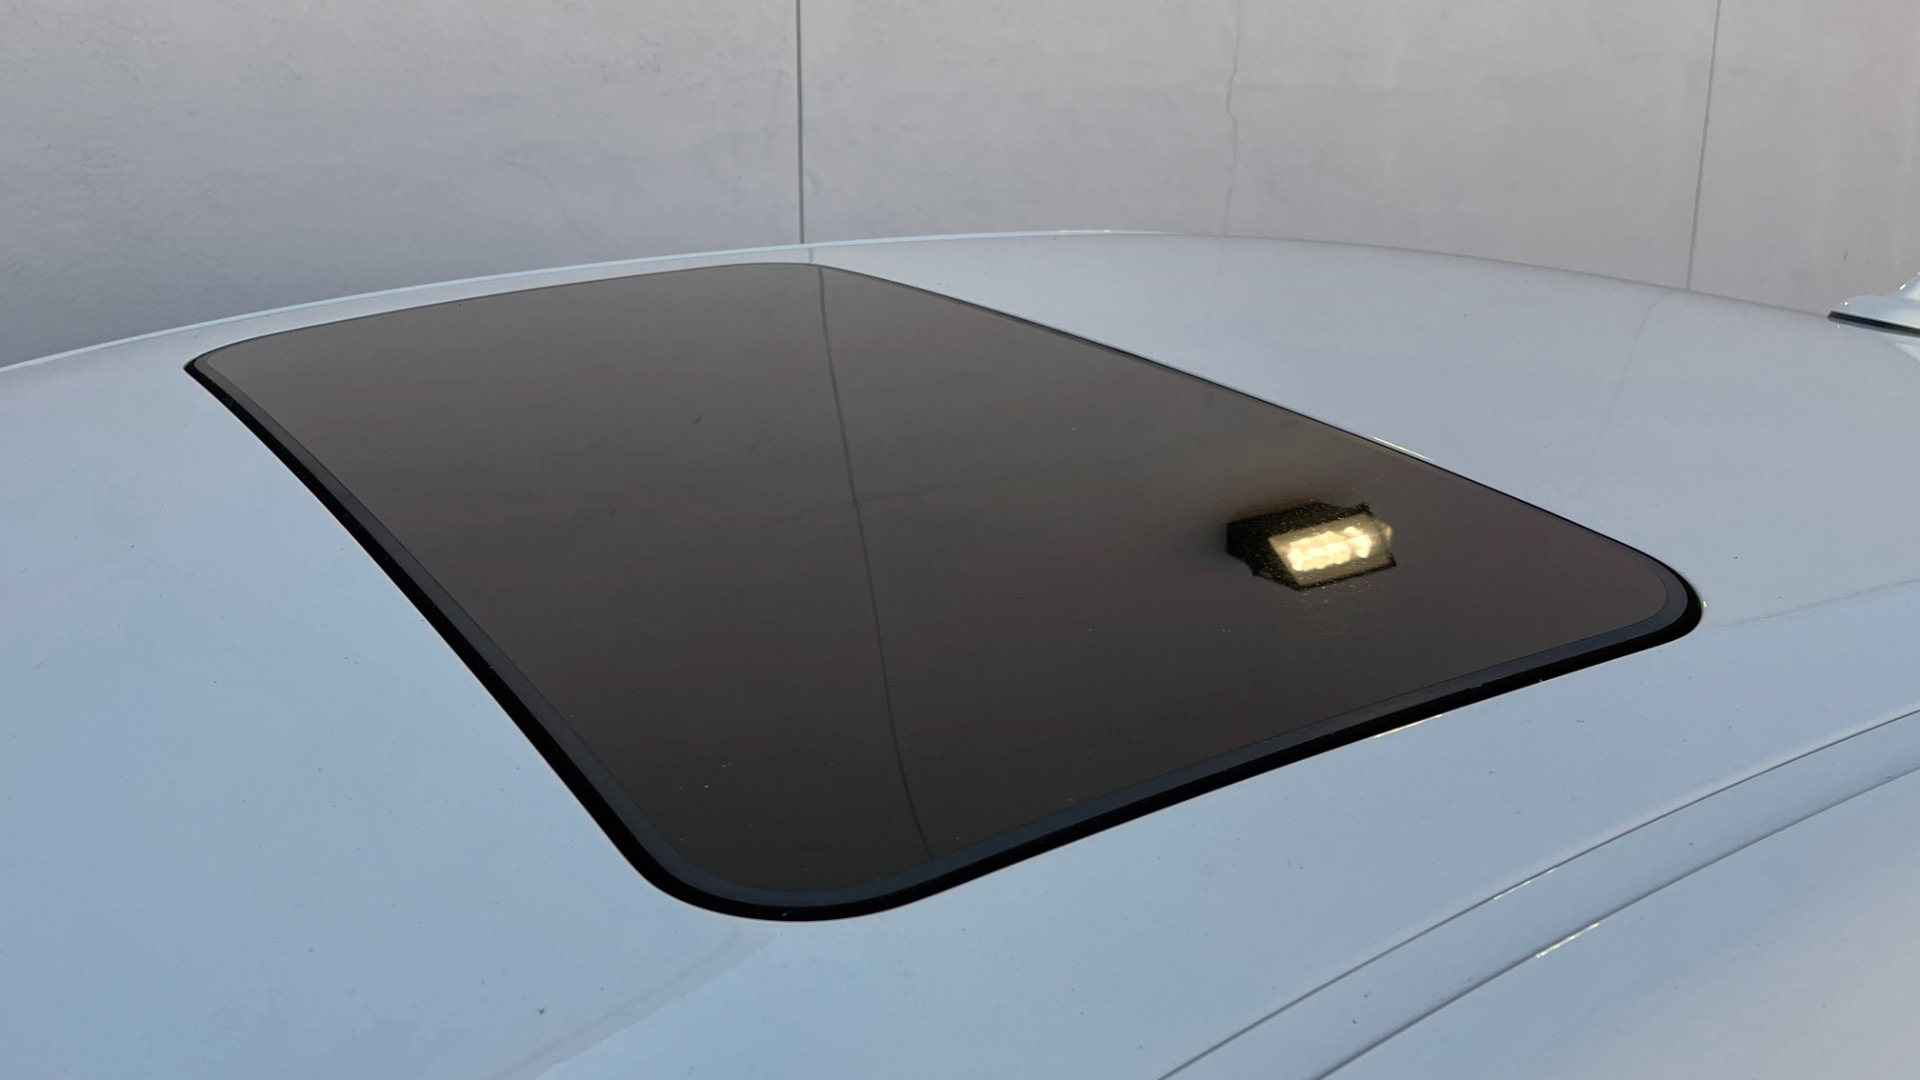 Used 2018 Maserati GHIBLI SEDAN / RWD / 3.0L V6 / SUNROOF / NAV / REARVIEW for sale $42,995 at Formula Imports in Charlotte NC 28227 10